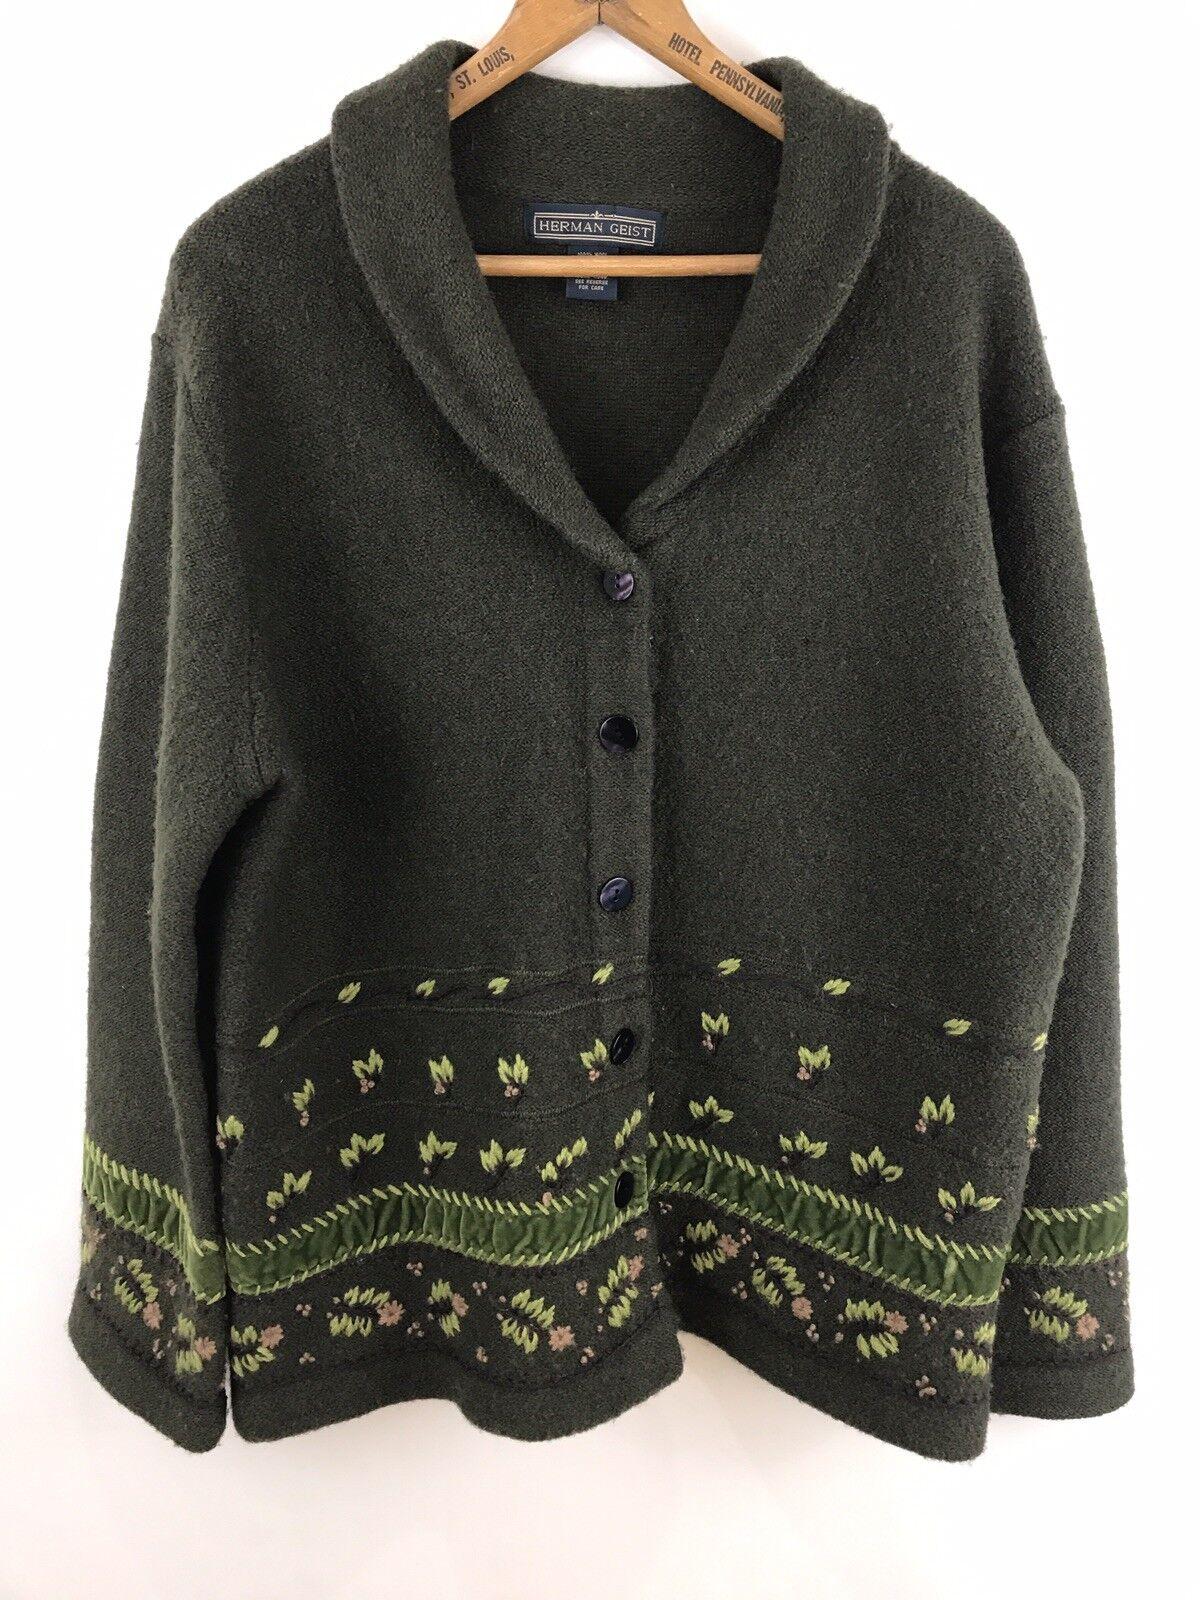 Herman Geist Women's Small Cardigan Sweater 100% Wool Forest Green Embellished